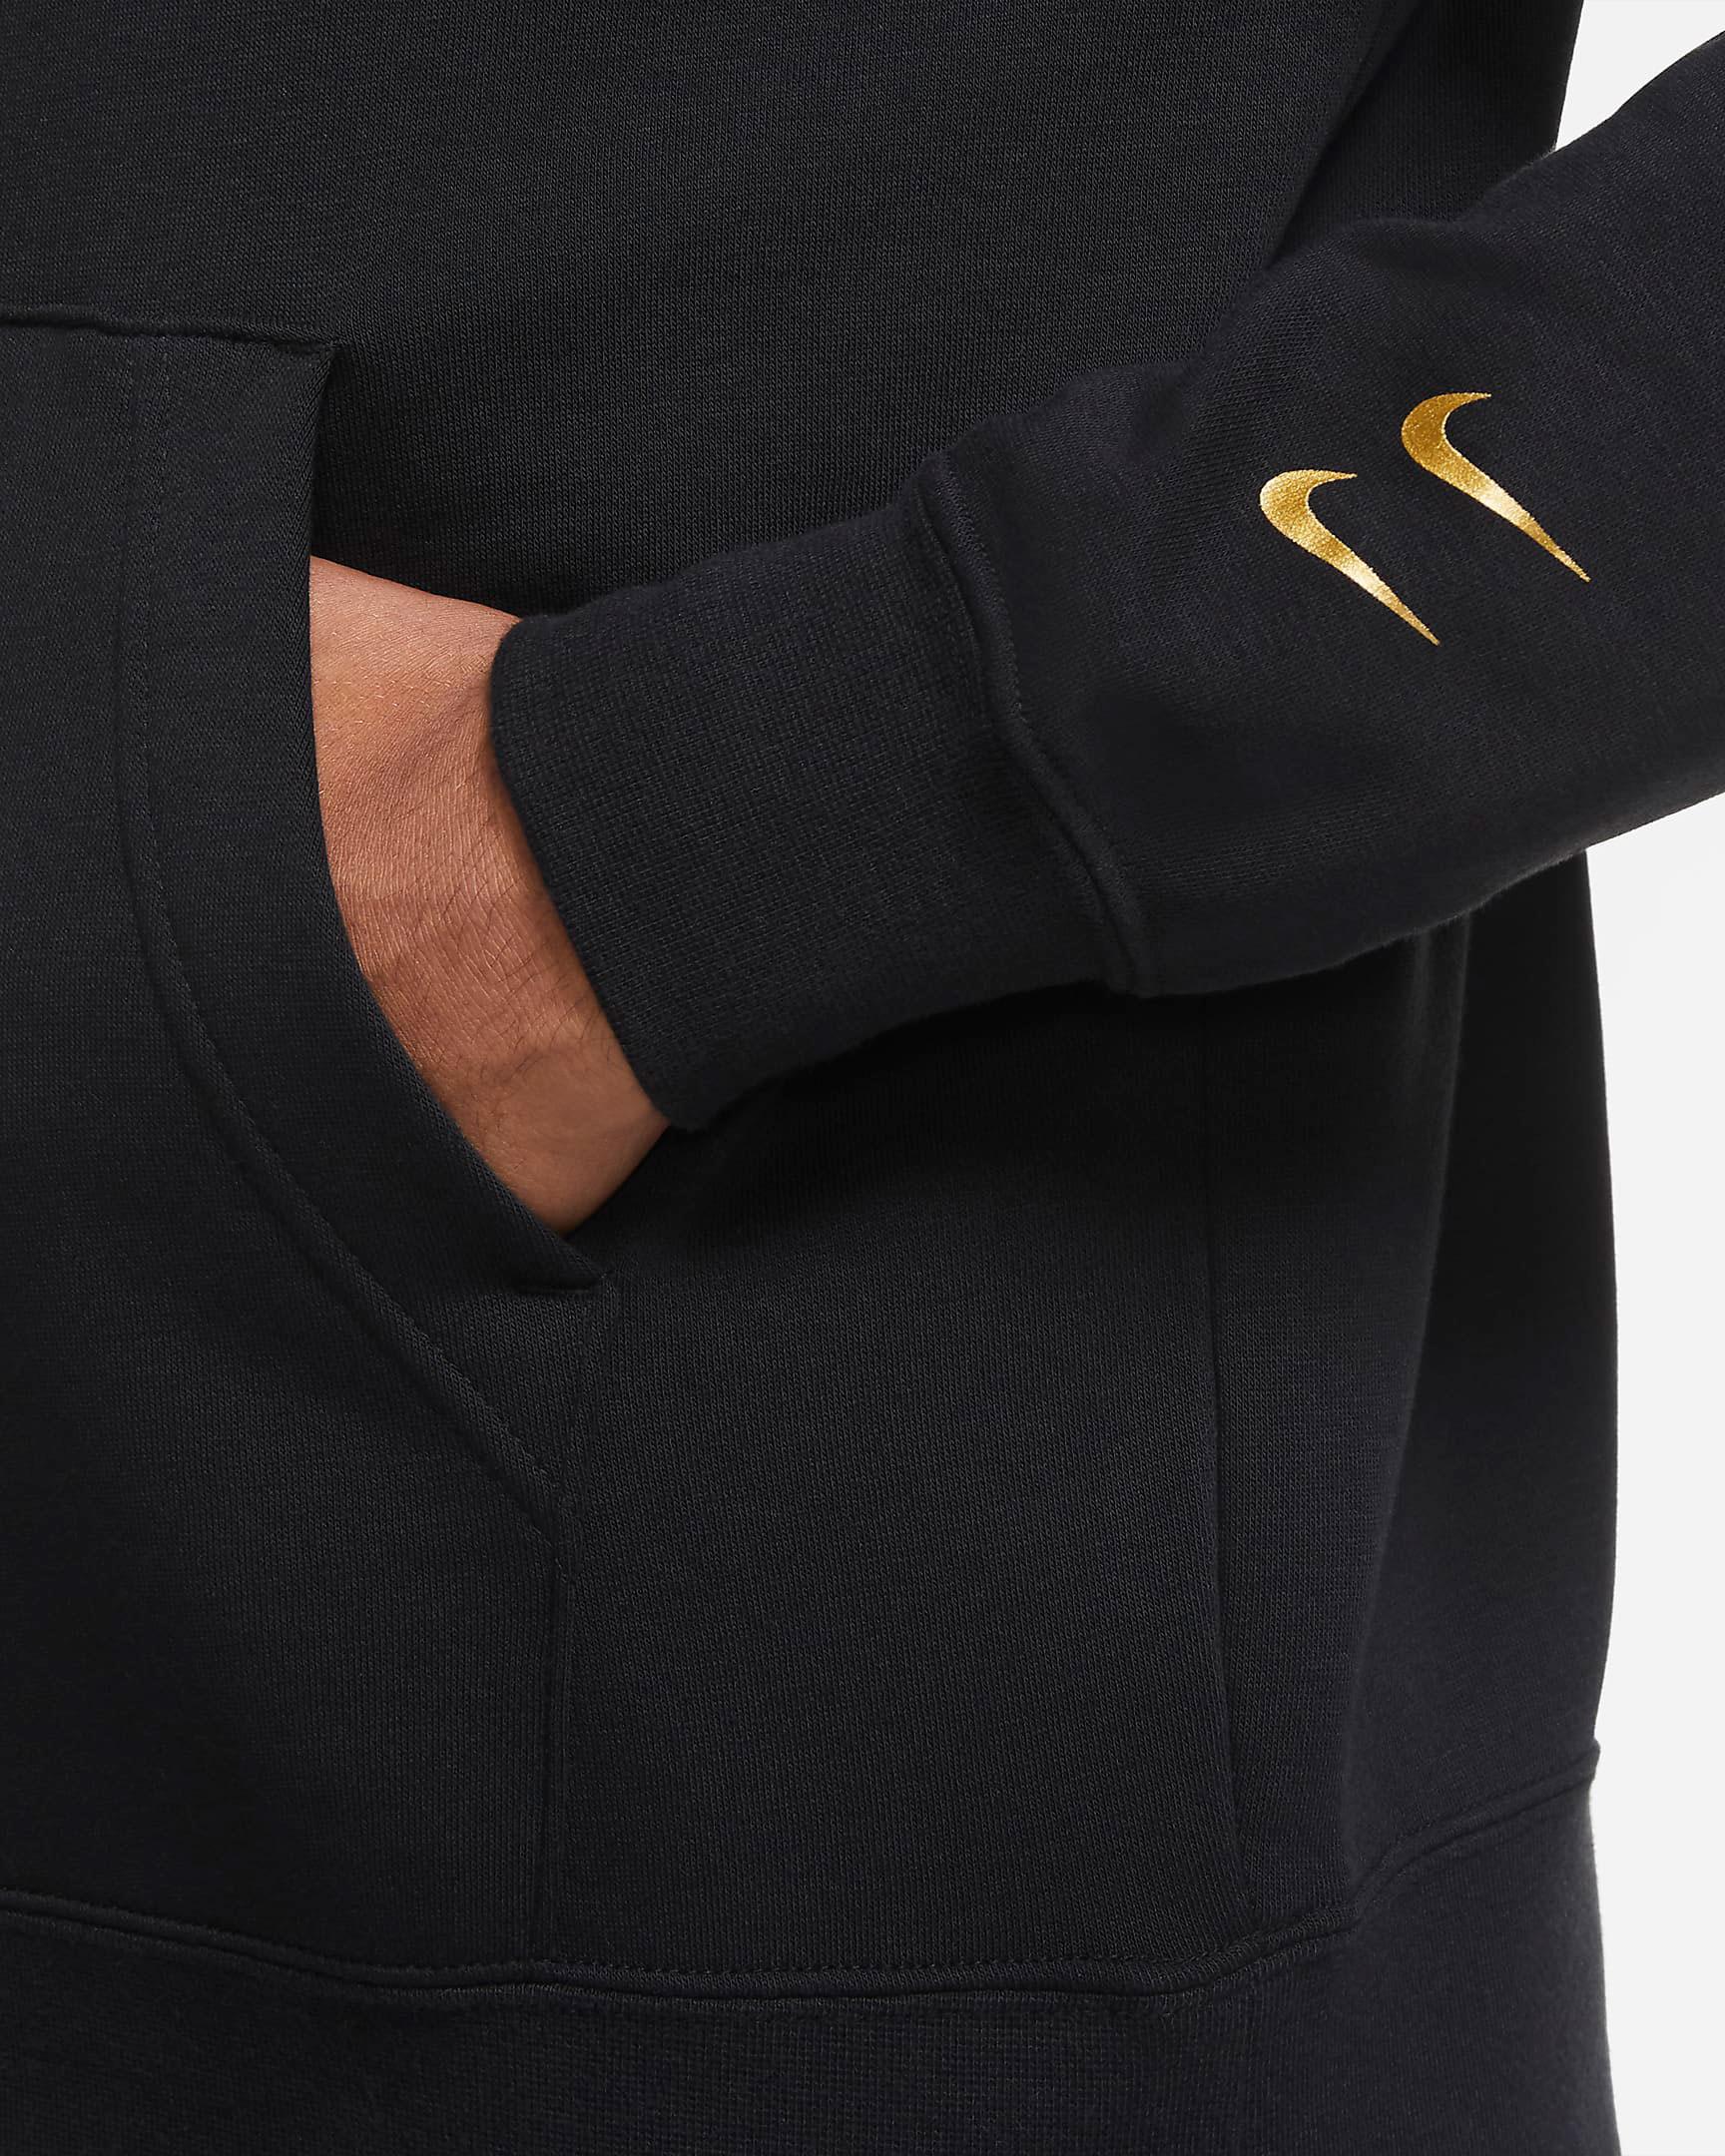 nike-sportswear-swoosh-hoodie-black-metallic-gold-4